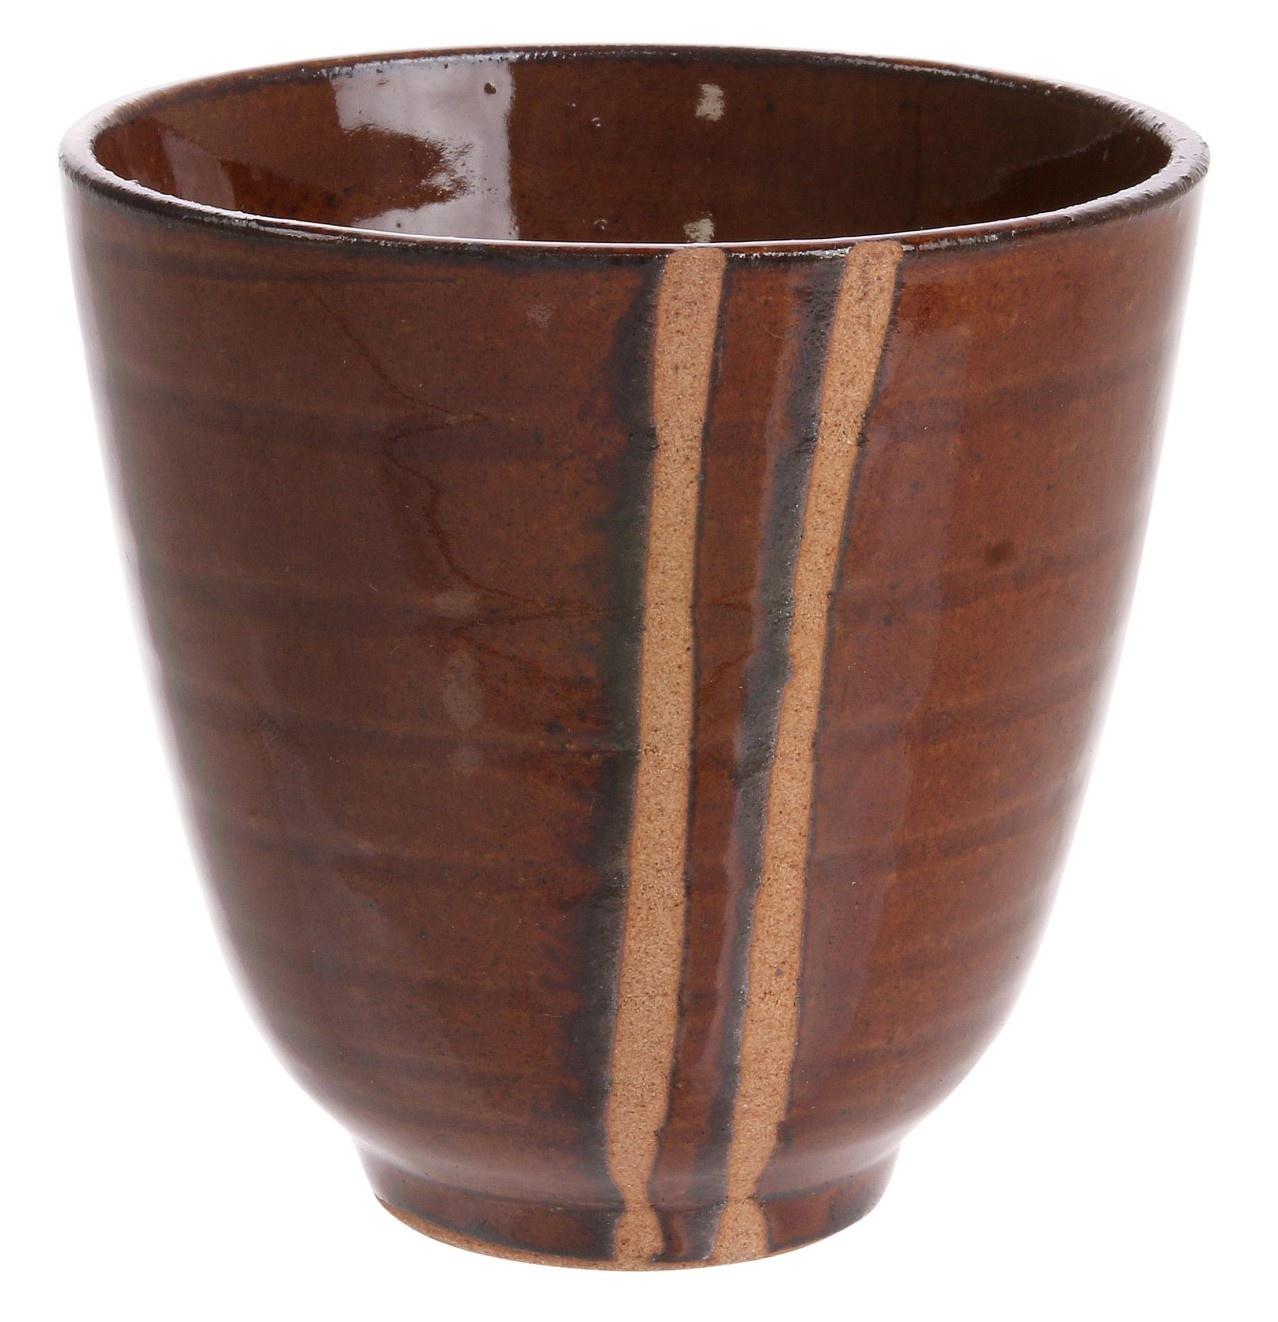 Mok kyoto ceramics: japanese yunomi mugs bruin-1